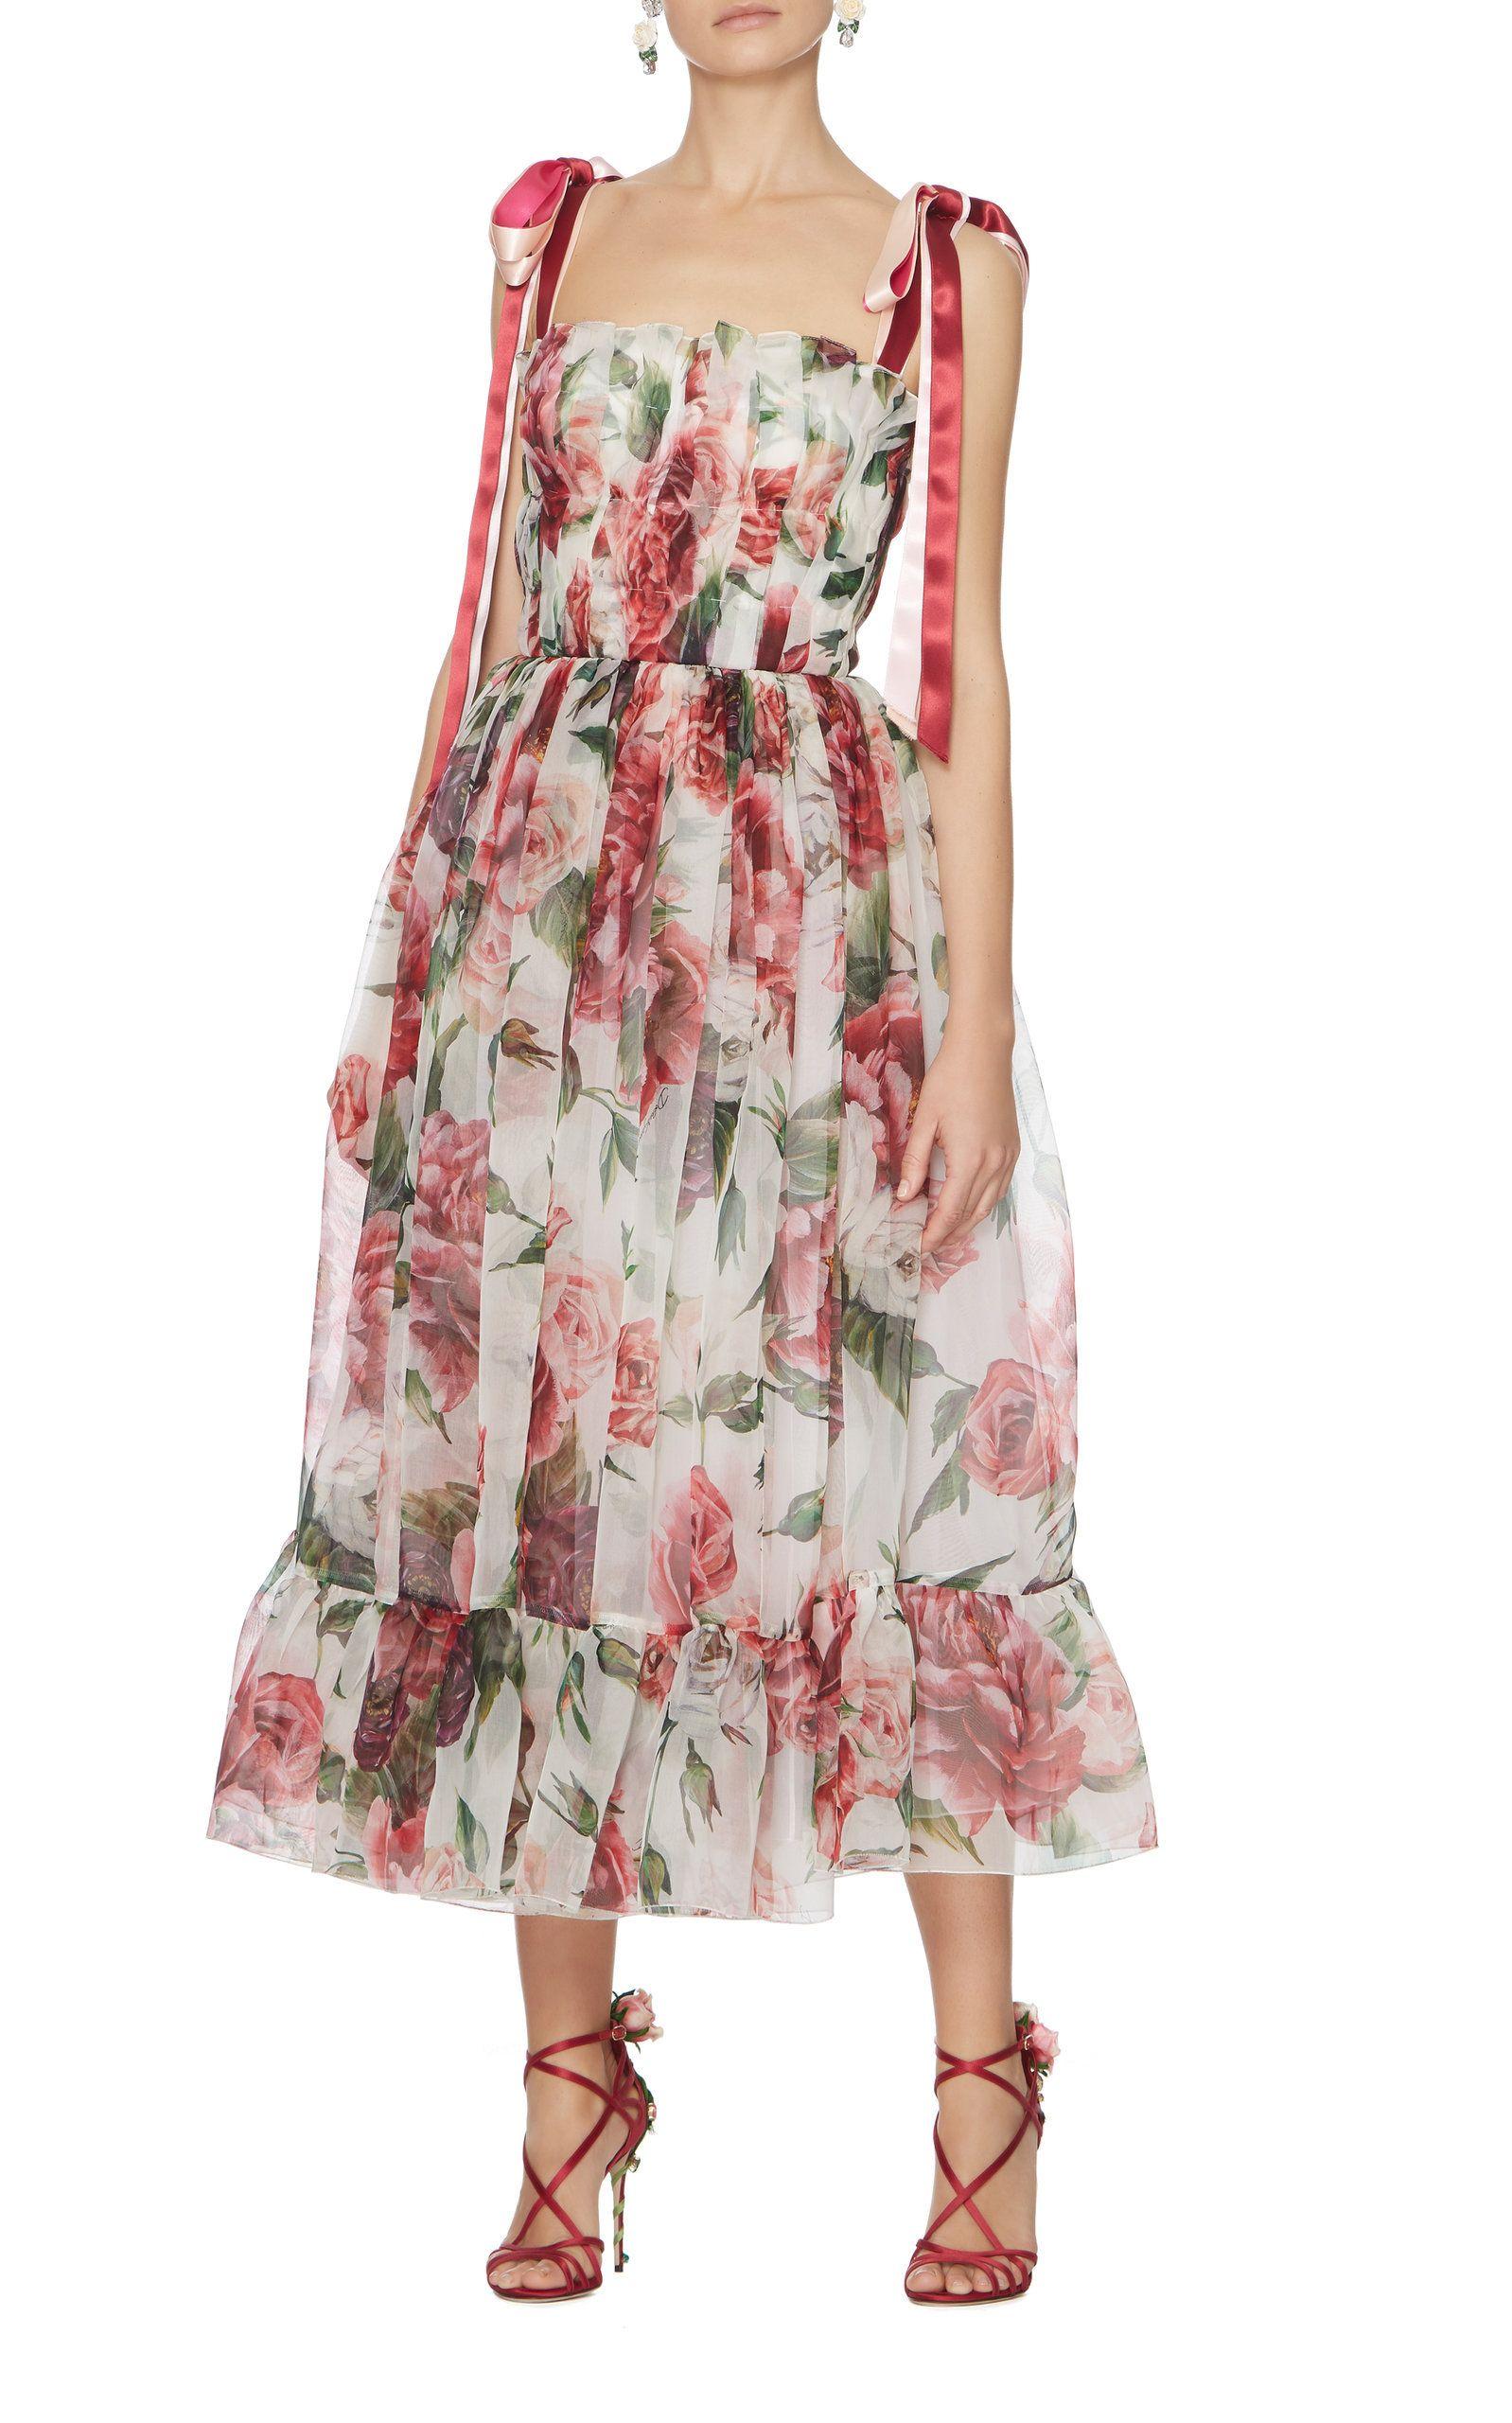 0a632181fc2f0 Dolce   Gabbana Peony-Print Organza Midi Dress Floral   Clothing ...